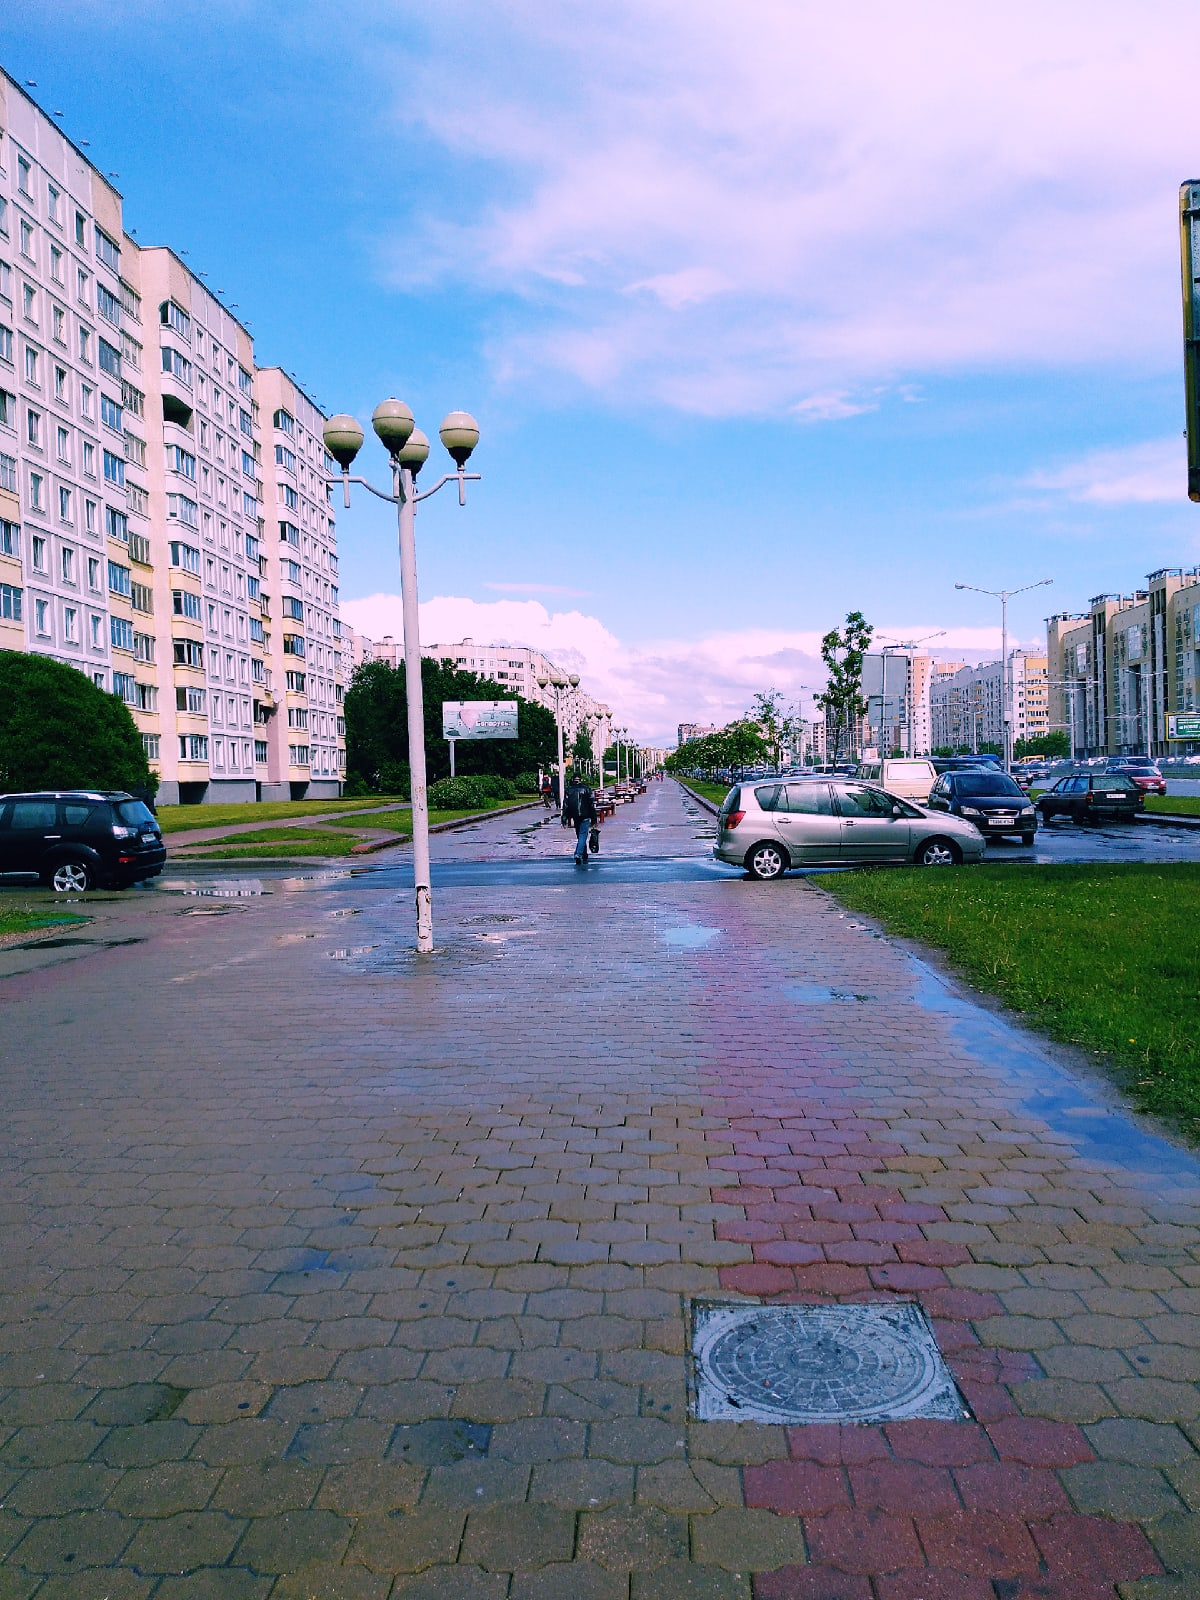 Минск во время пандемии. ФОТОРЕПОРТАЖ 10